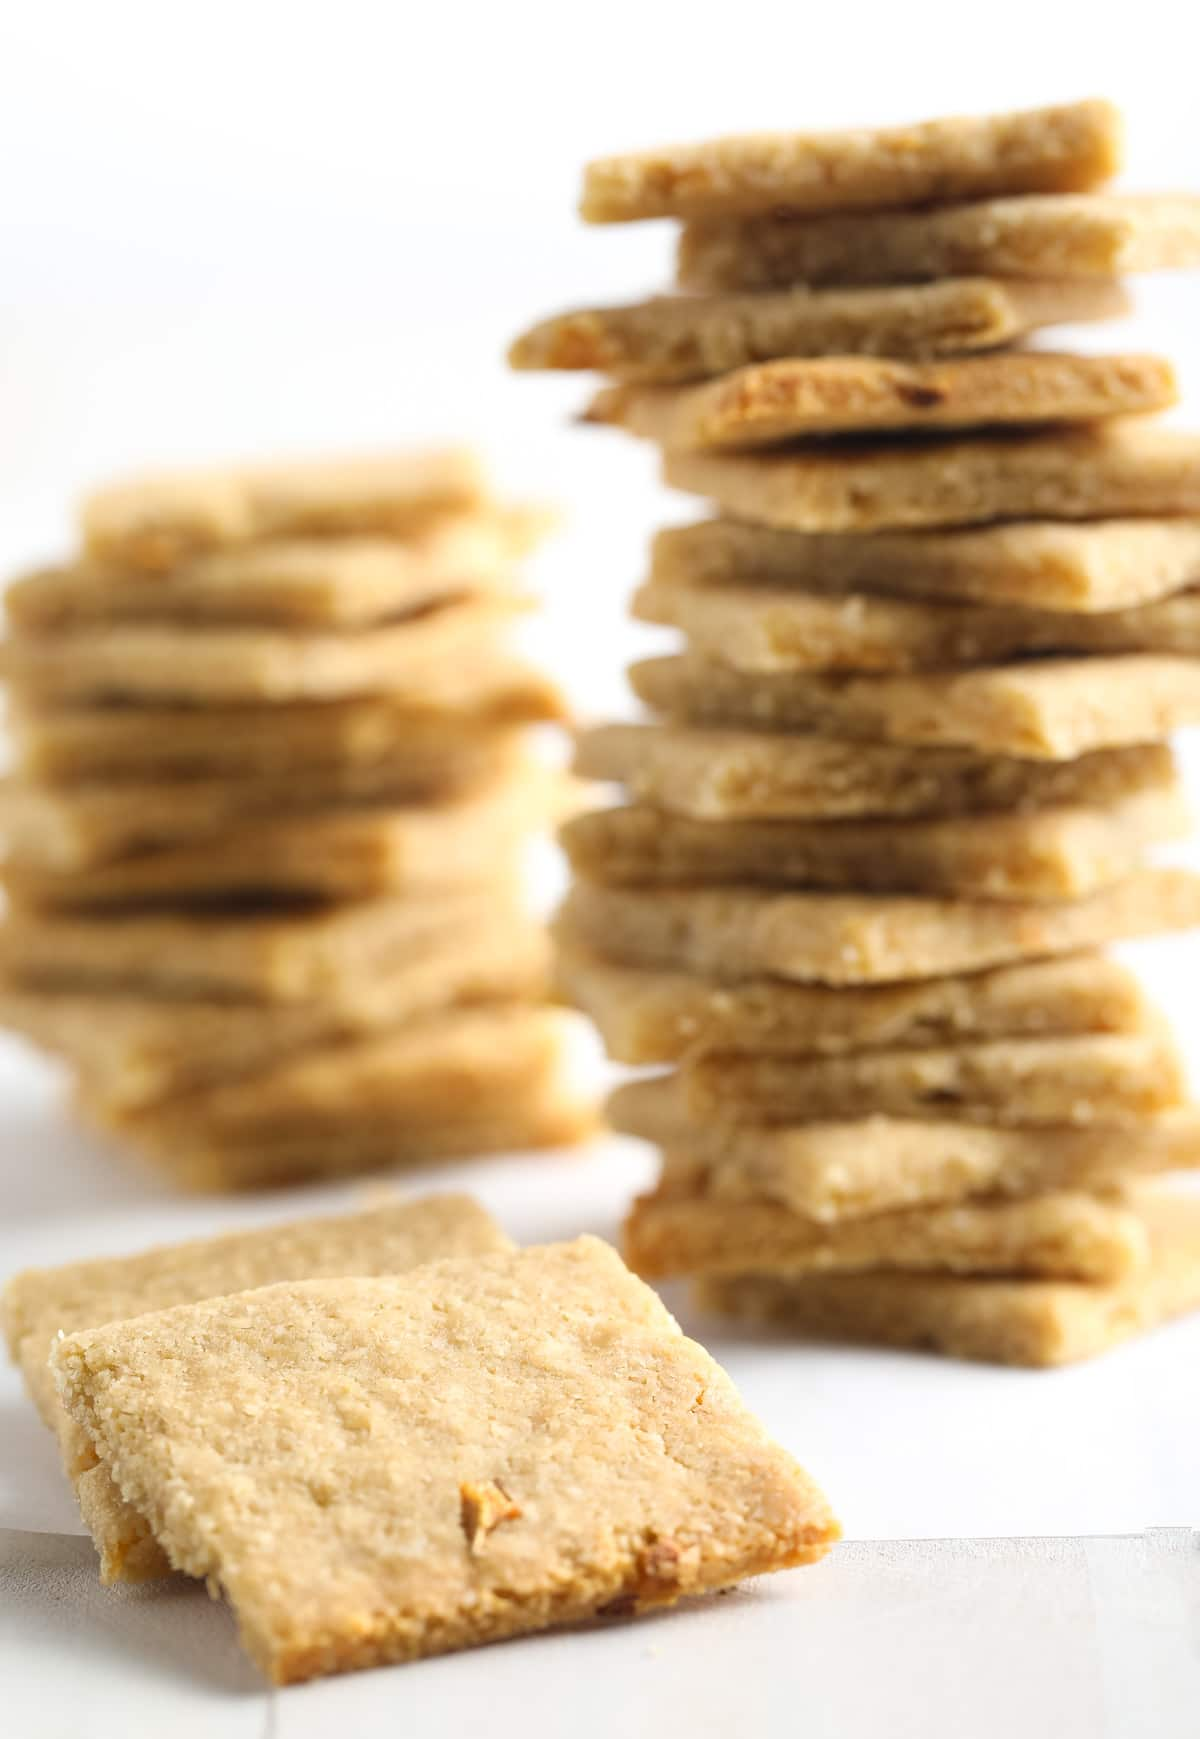 Crunchy French Onion Keto Crackers Recipe #ASpicyPerspective #paleo #whole30 #ketogenic